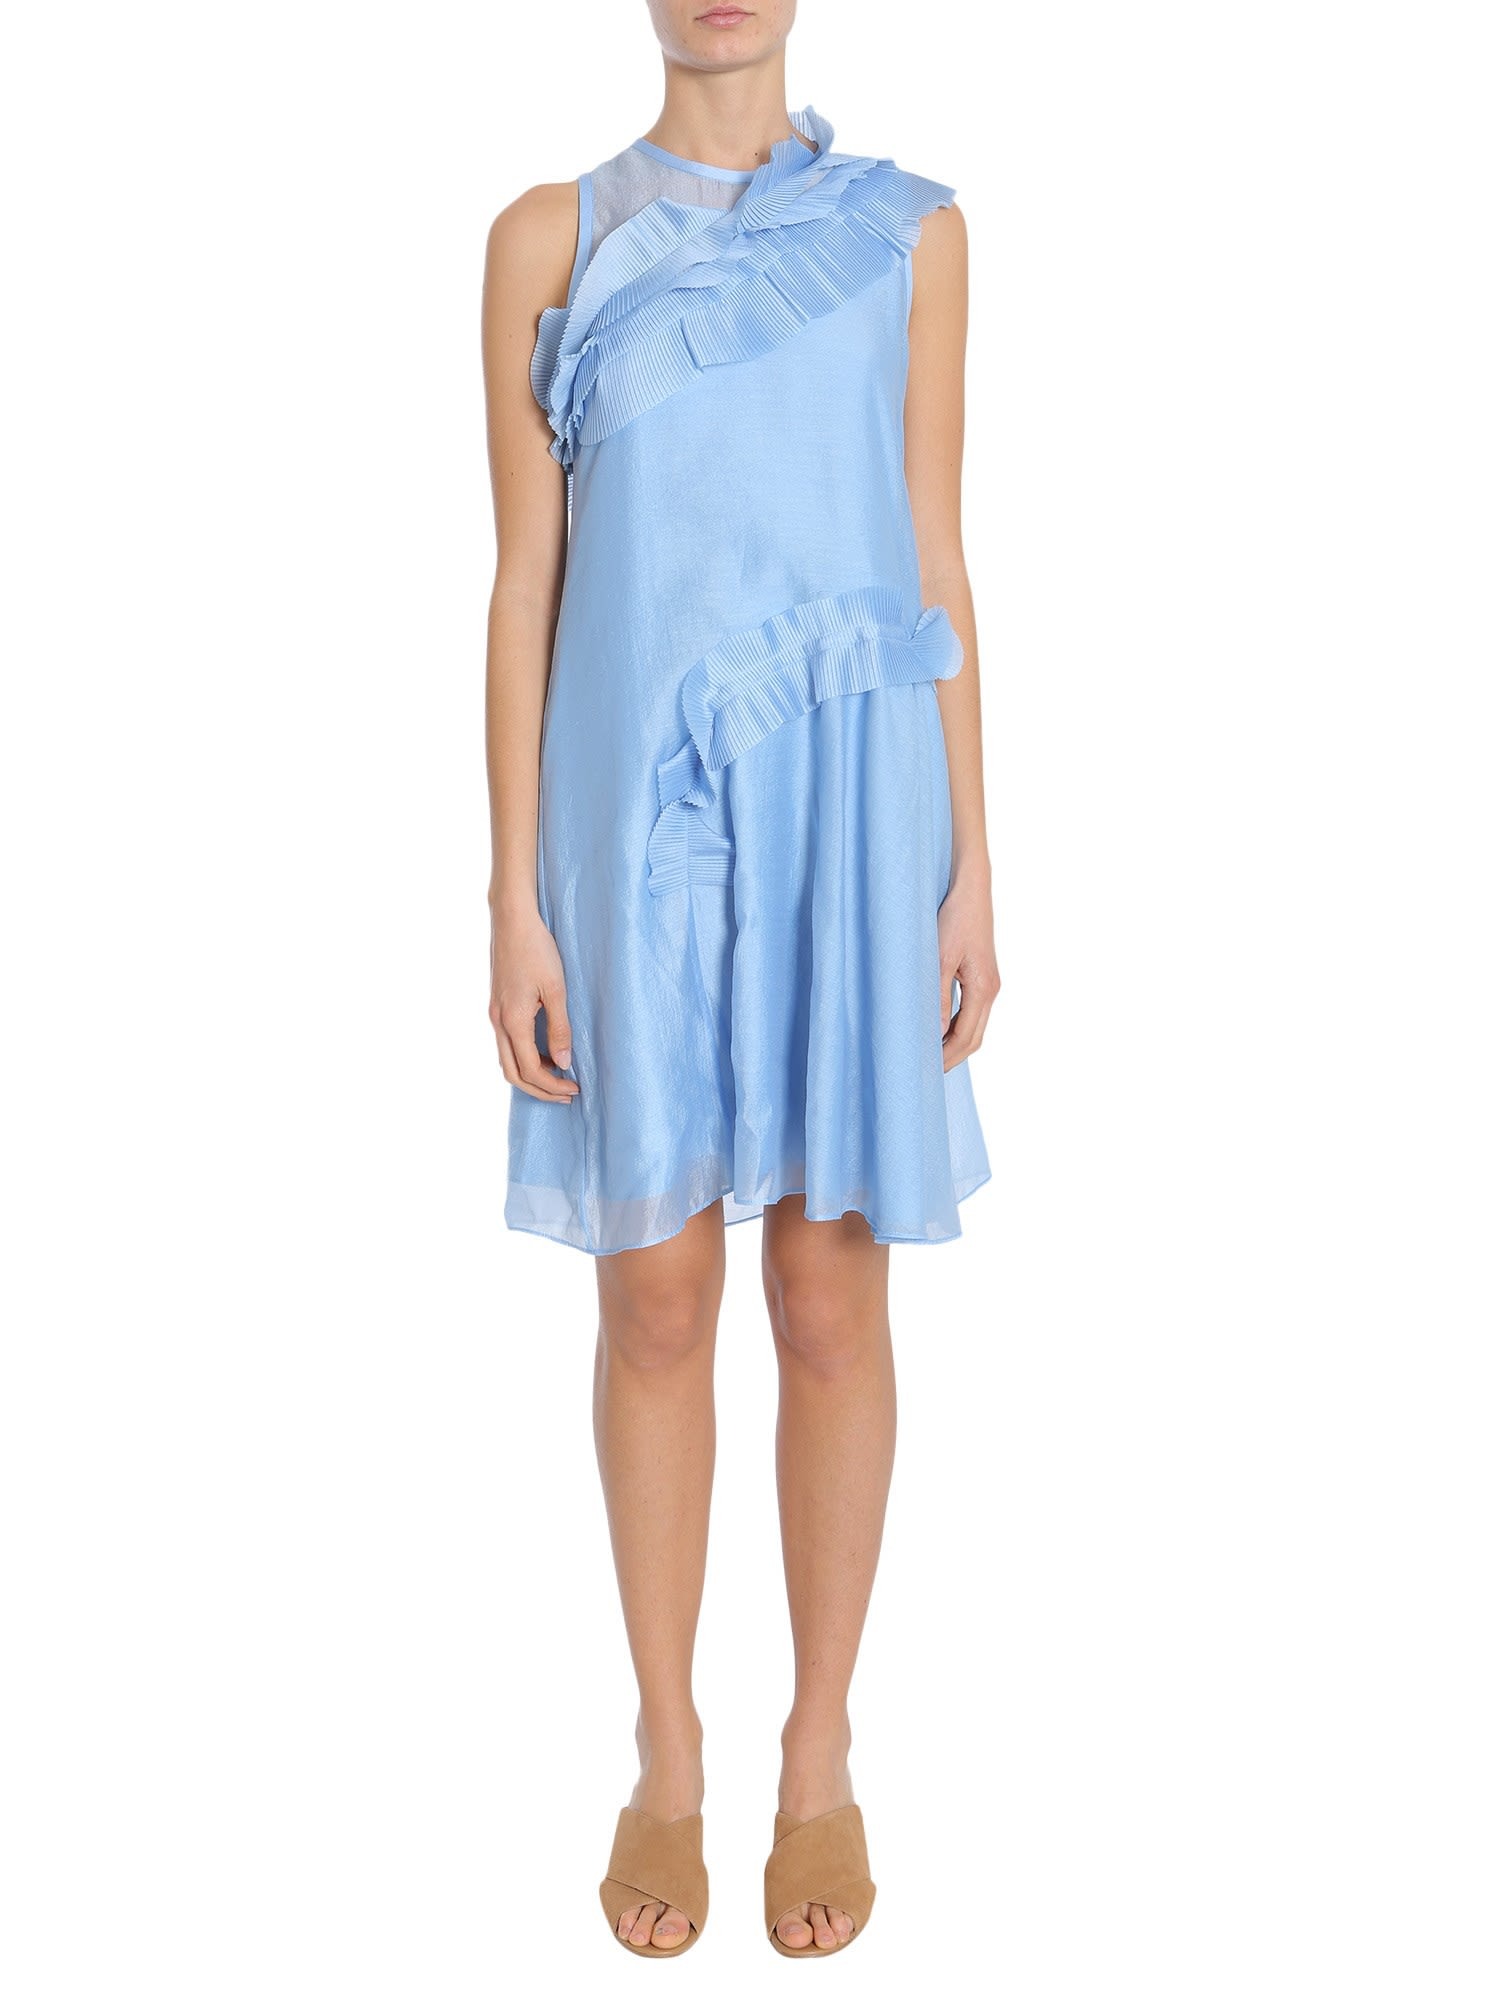 028fb1ad81 Carven Sleeveless Dress